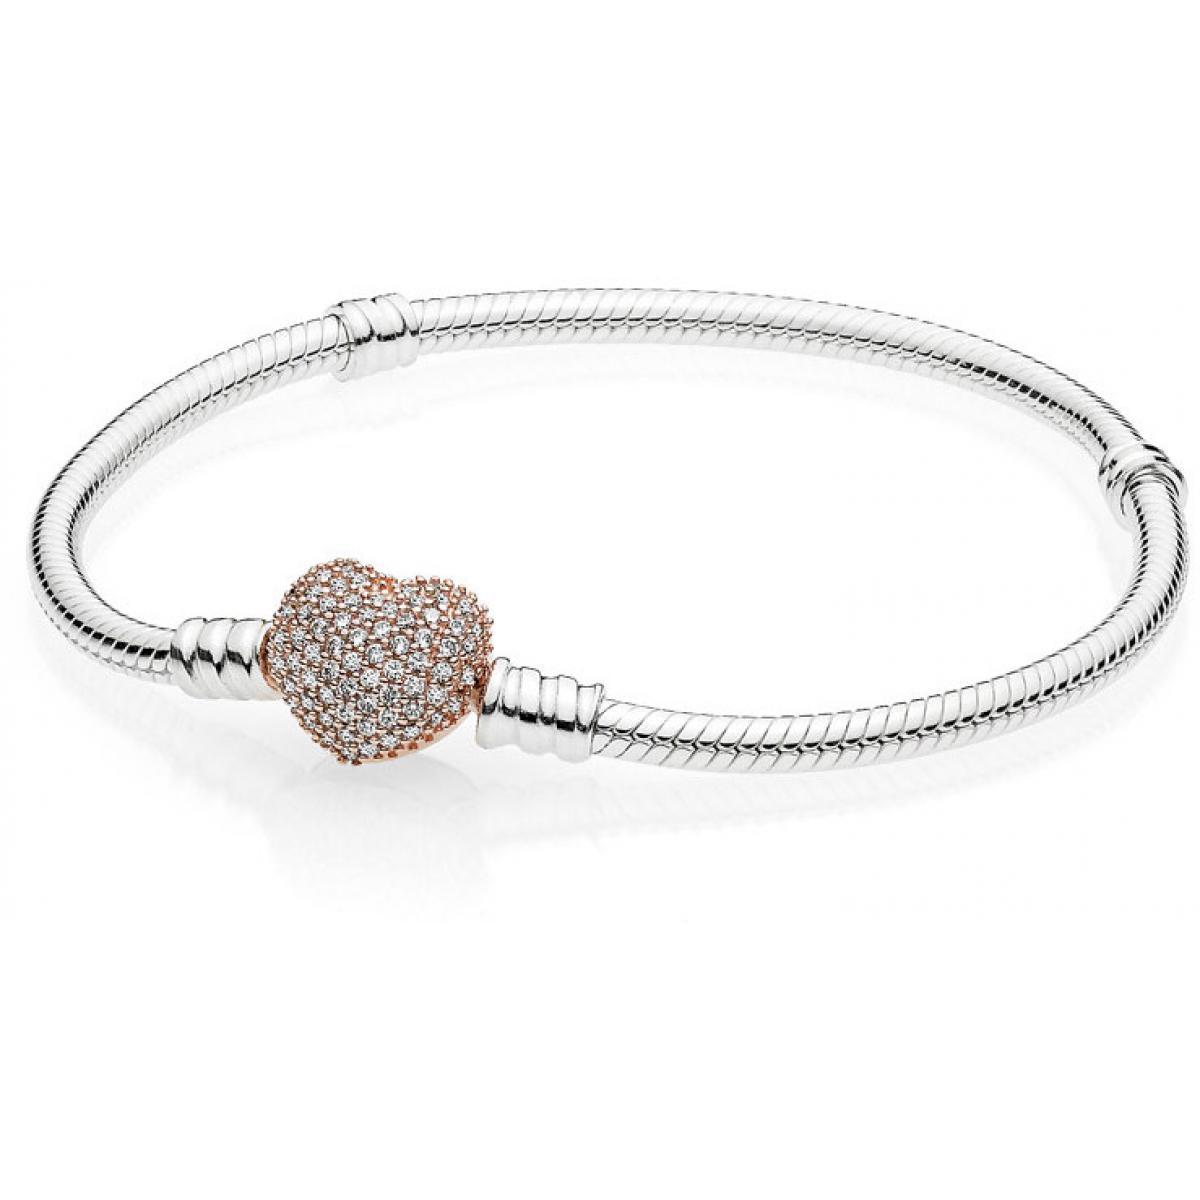 Bracelet Pandora 586292CZ - Bracelet Coeur Pavé Rose Femme